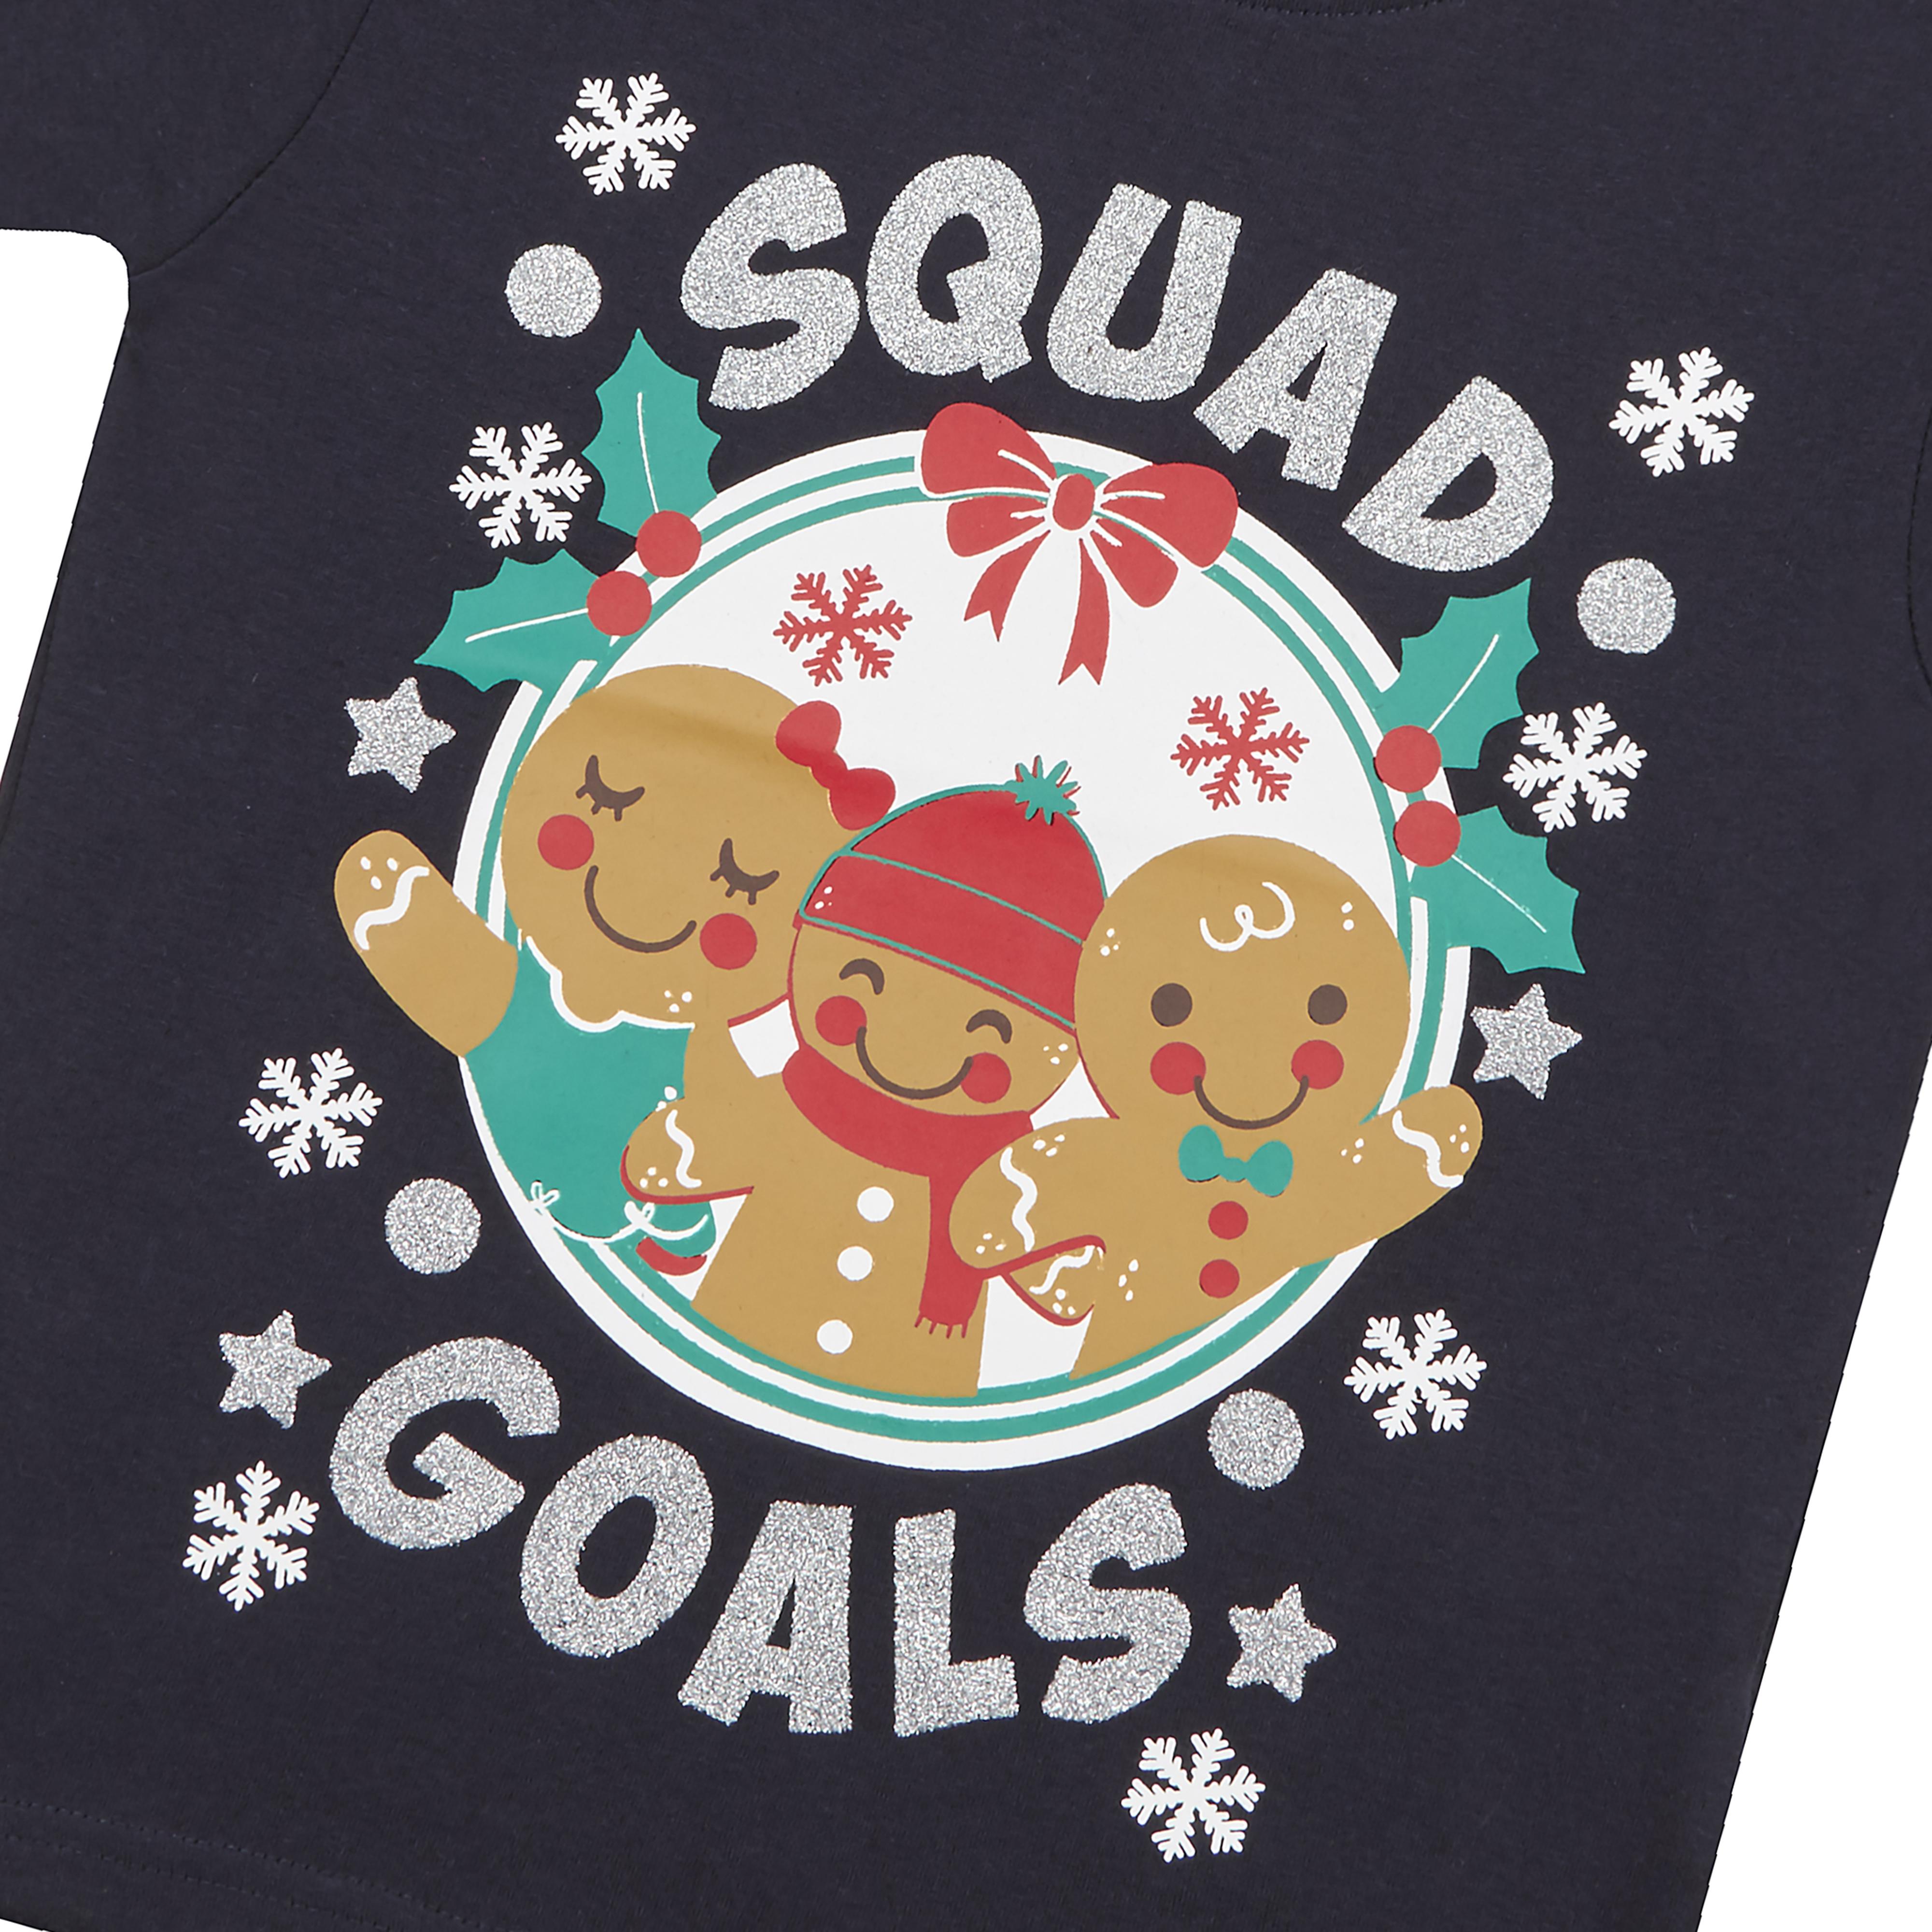 Childrens-Girls-Boys-Xmas-T-Shirts-Printed-Christmas-Design-100-Cotton-2-13-Yrs thumbnail 37